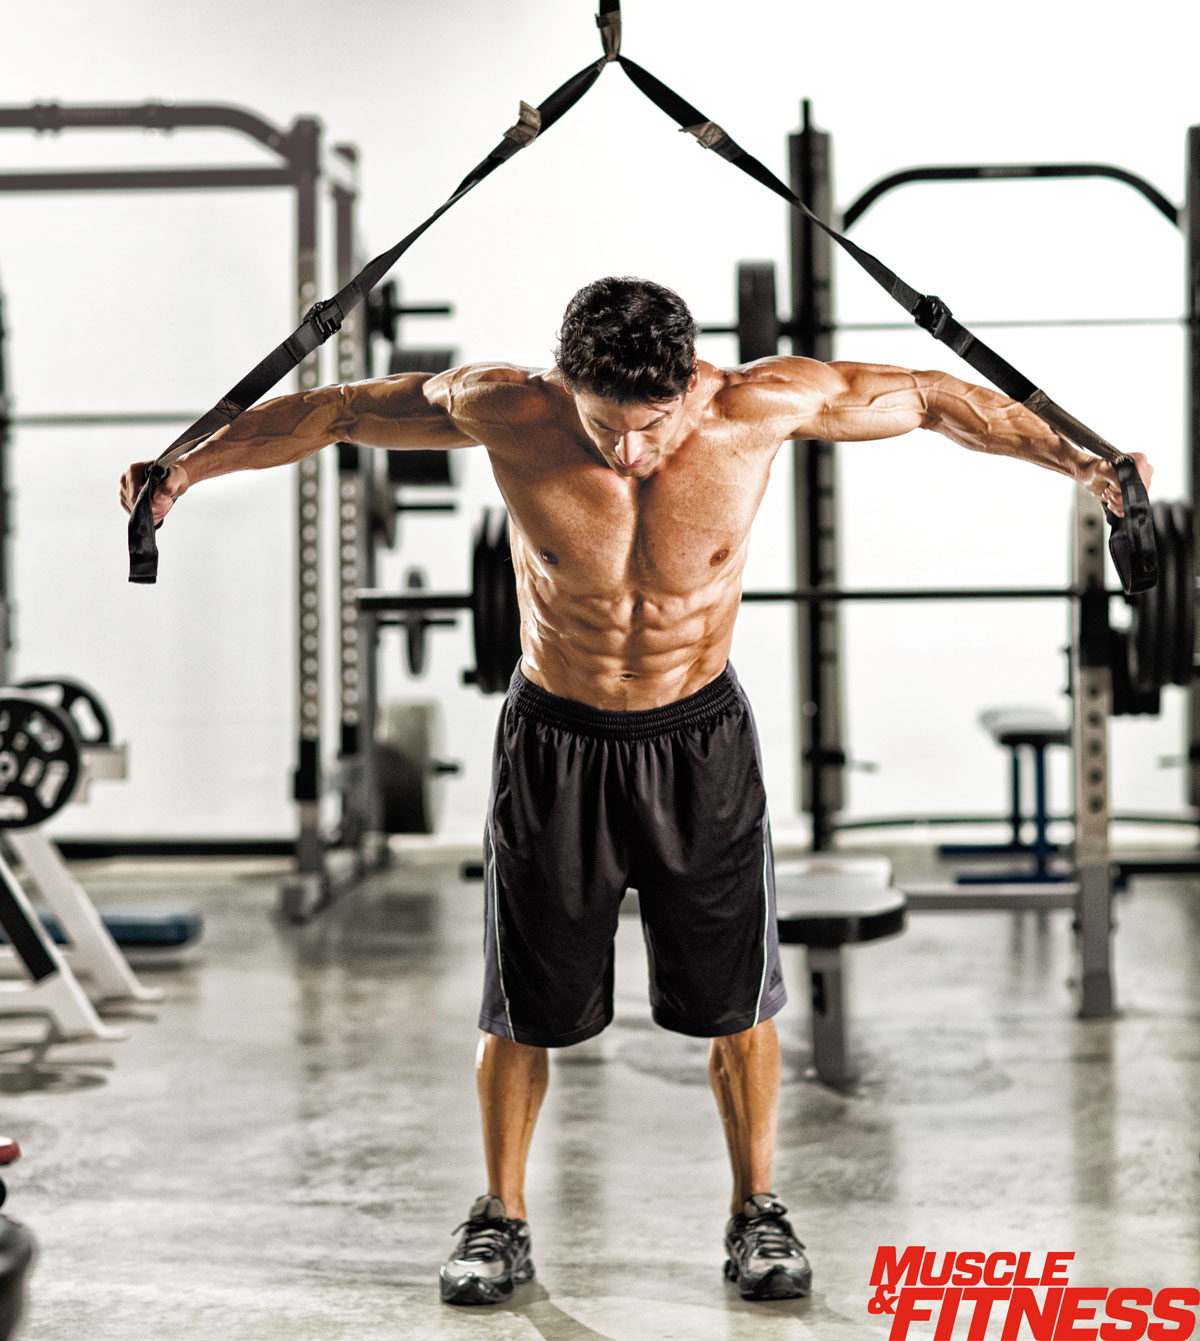 Gymnast biceps